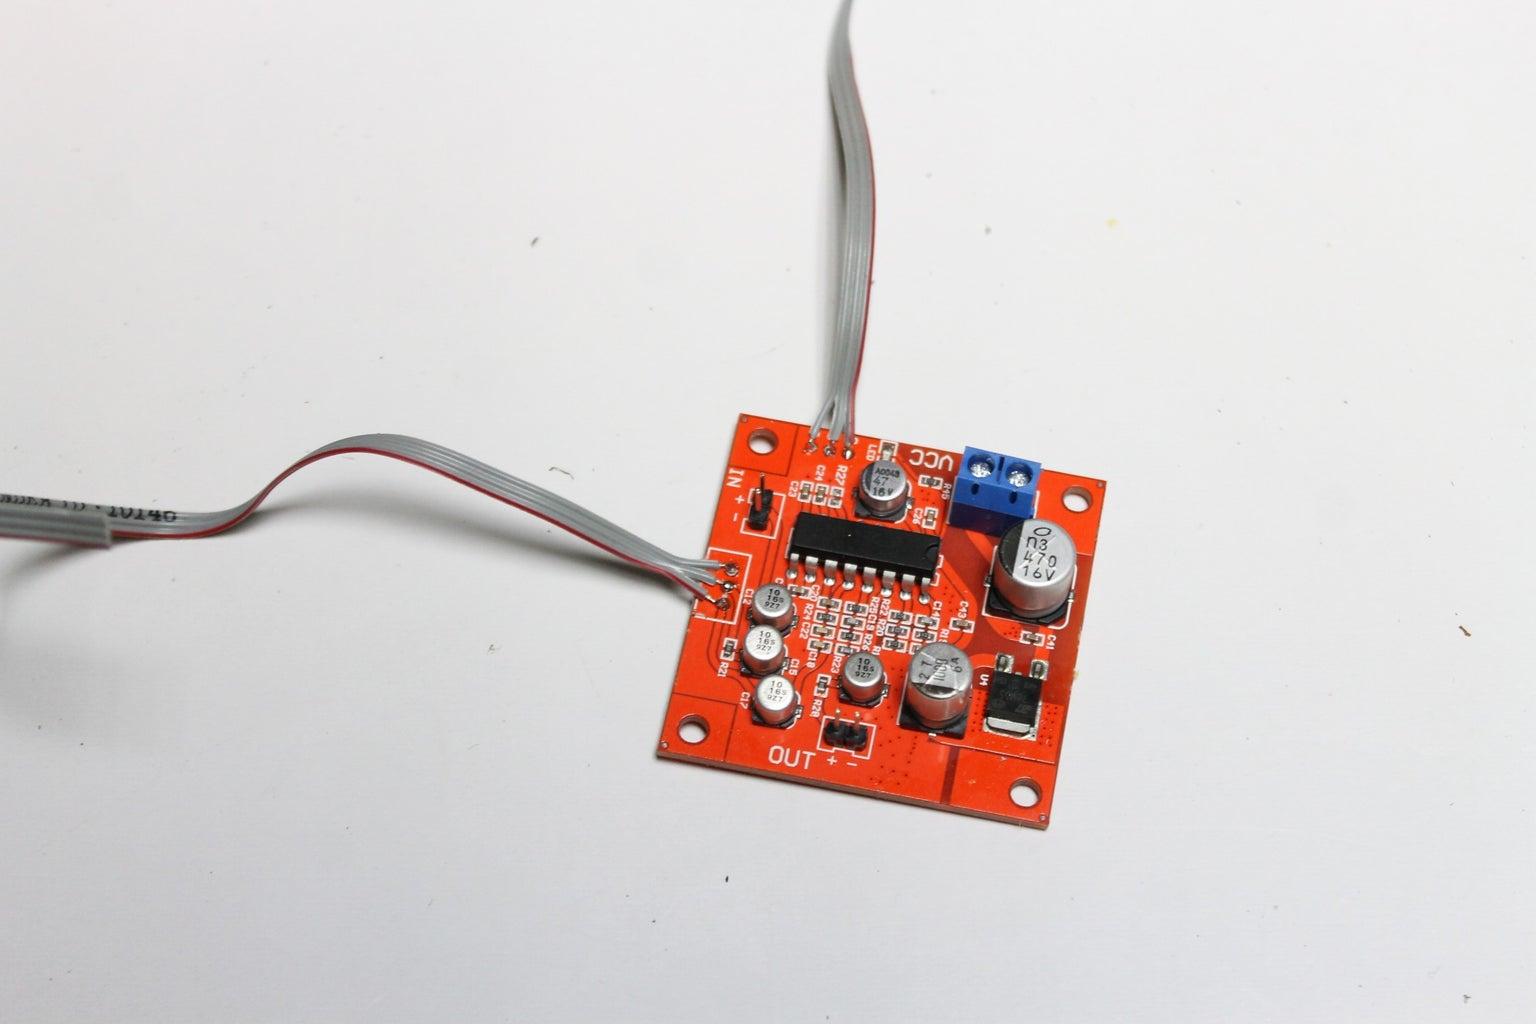 Wiring the Module